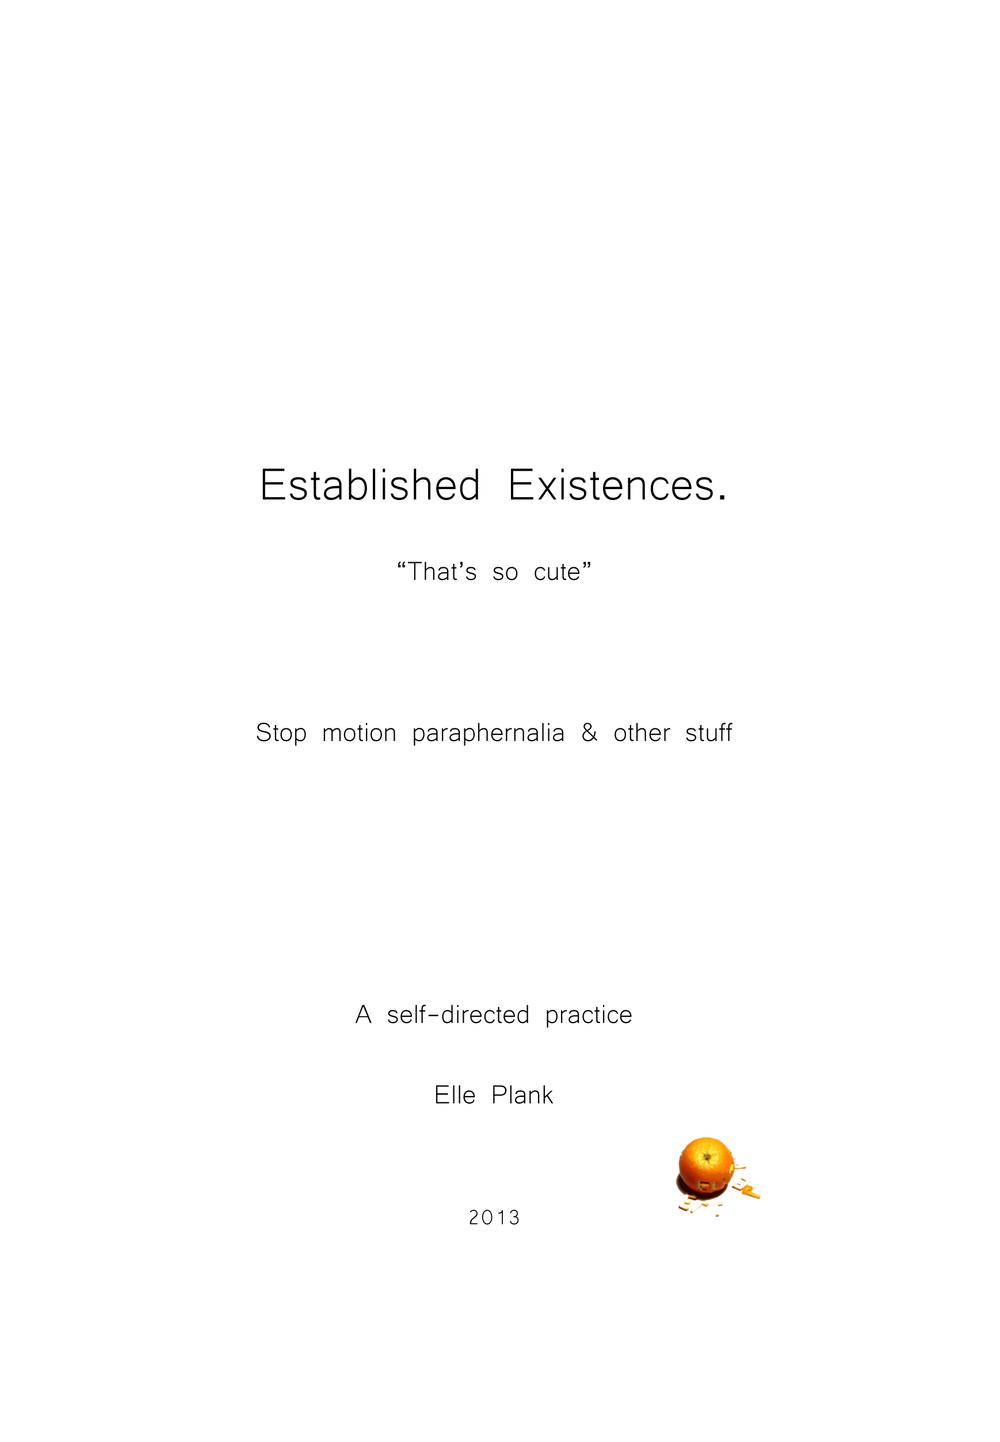 ex12.jpg